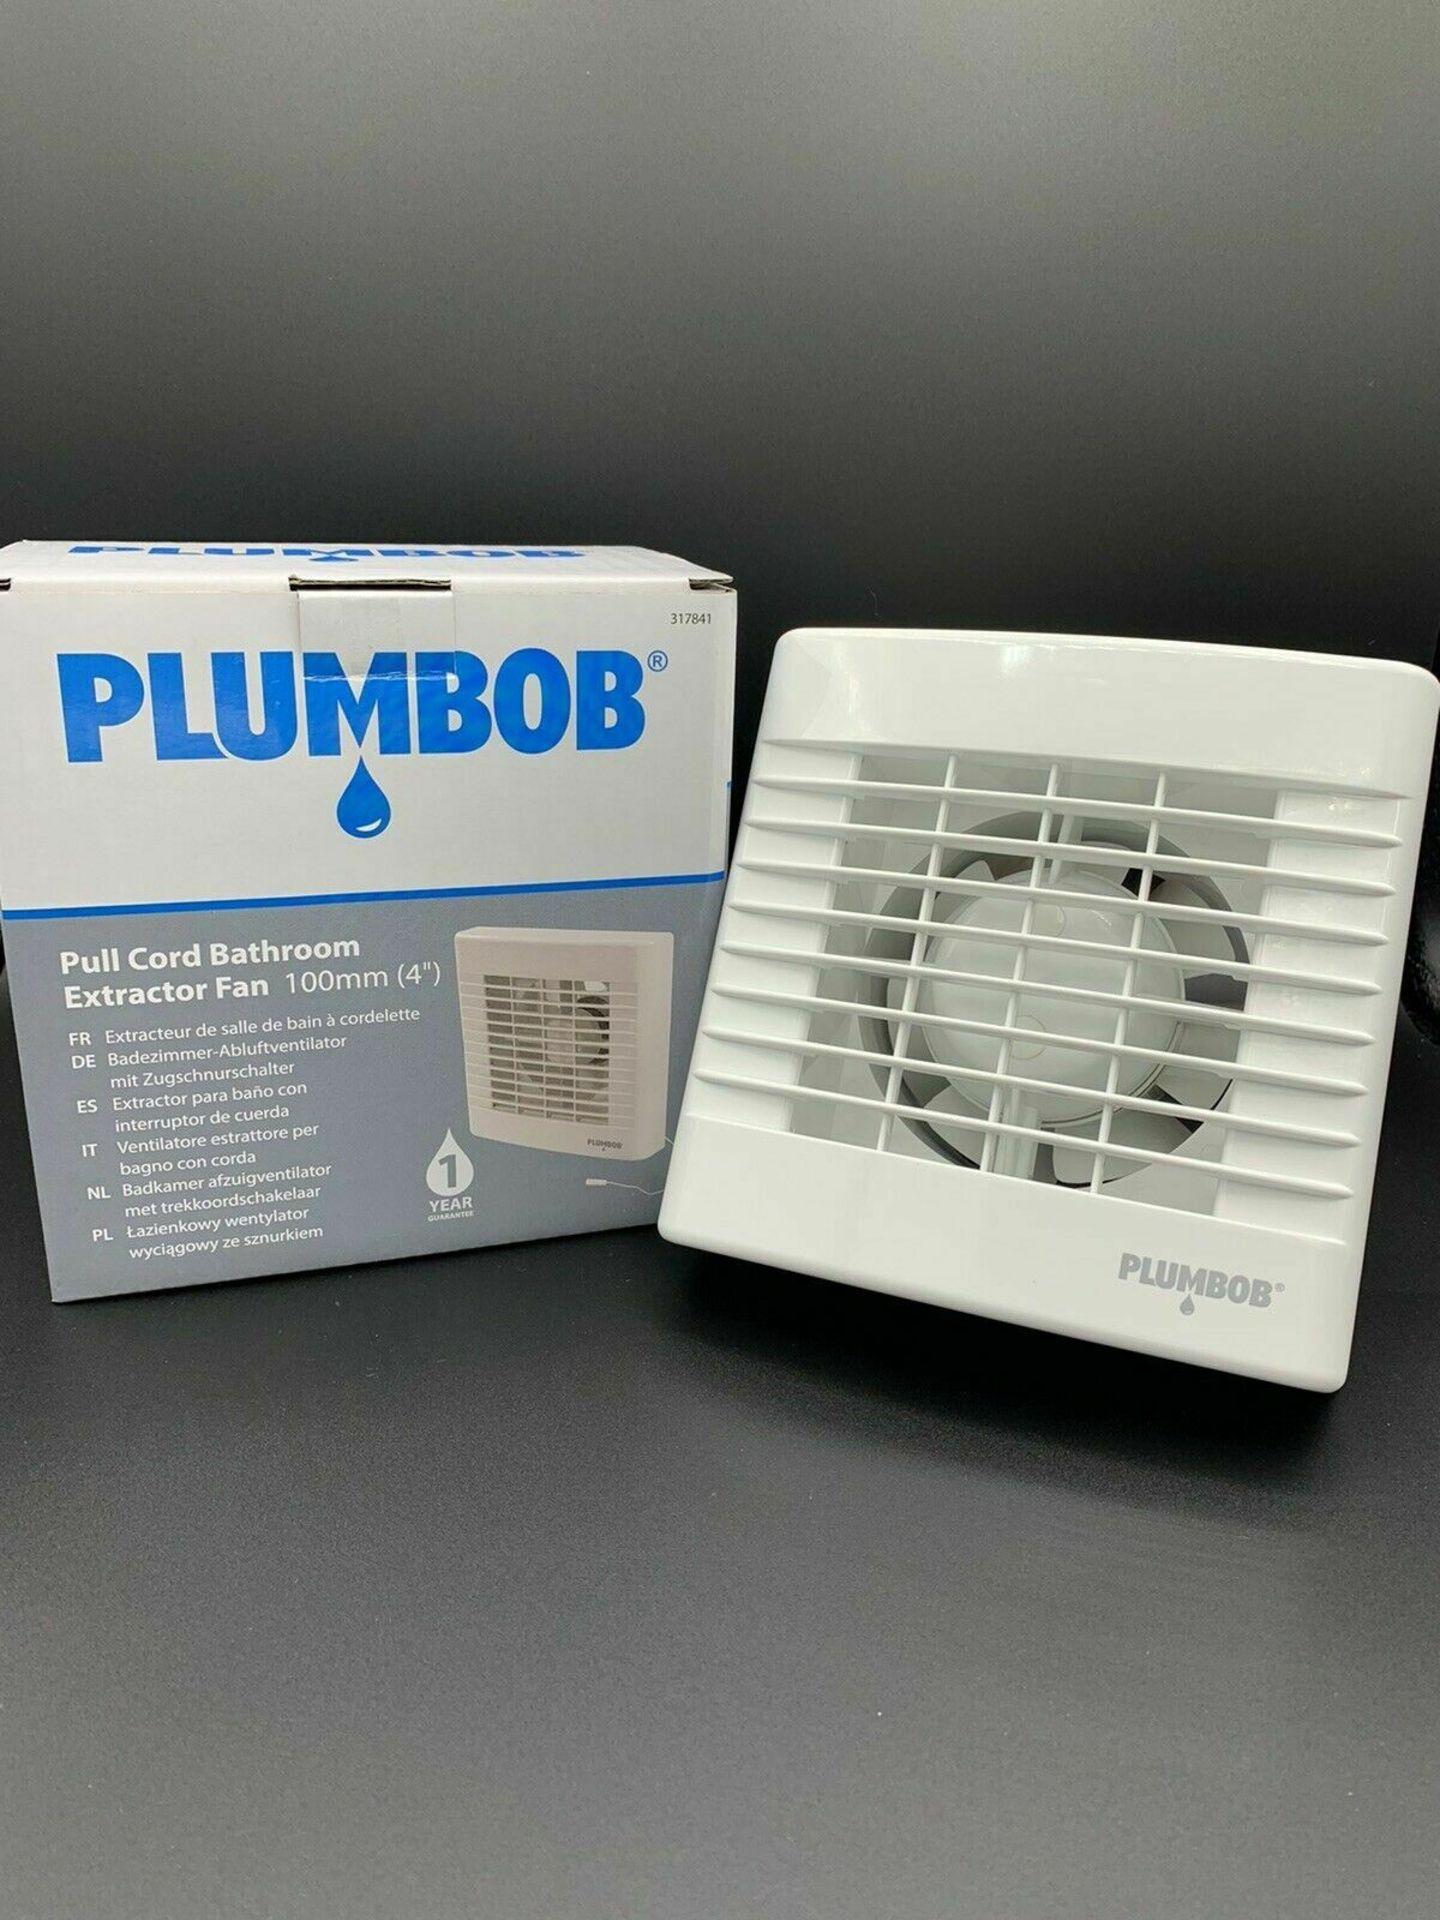 "Brand New Plumbob Pull Cord Bathroom Extractor Fans 100 mm (4"""")"